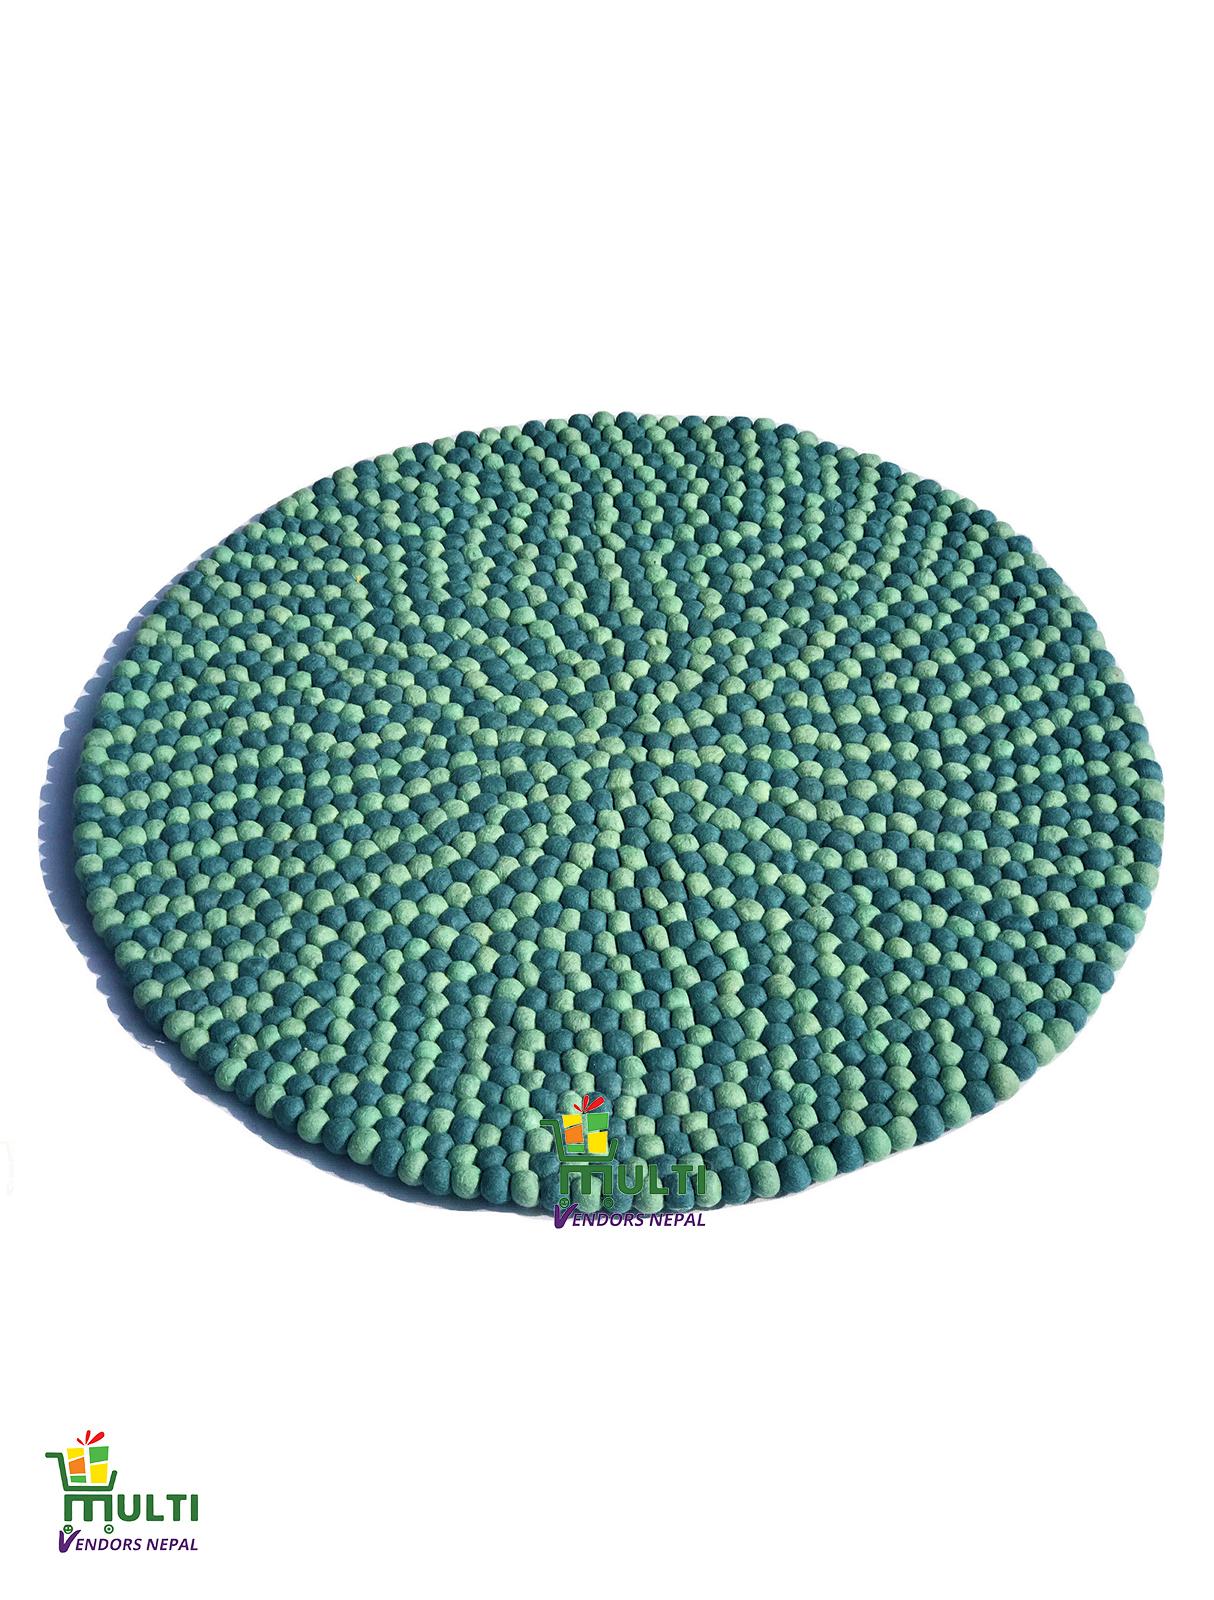 Aqua Round-MVSEBFR-017